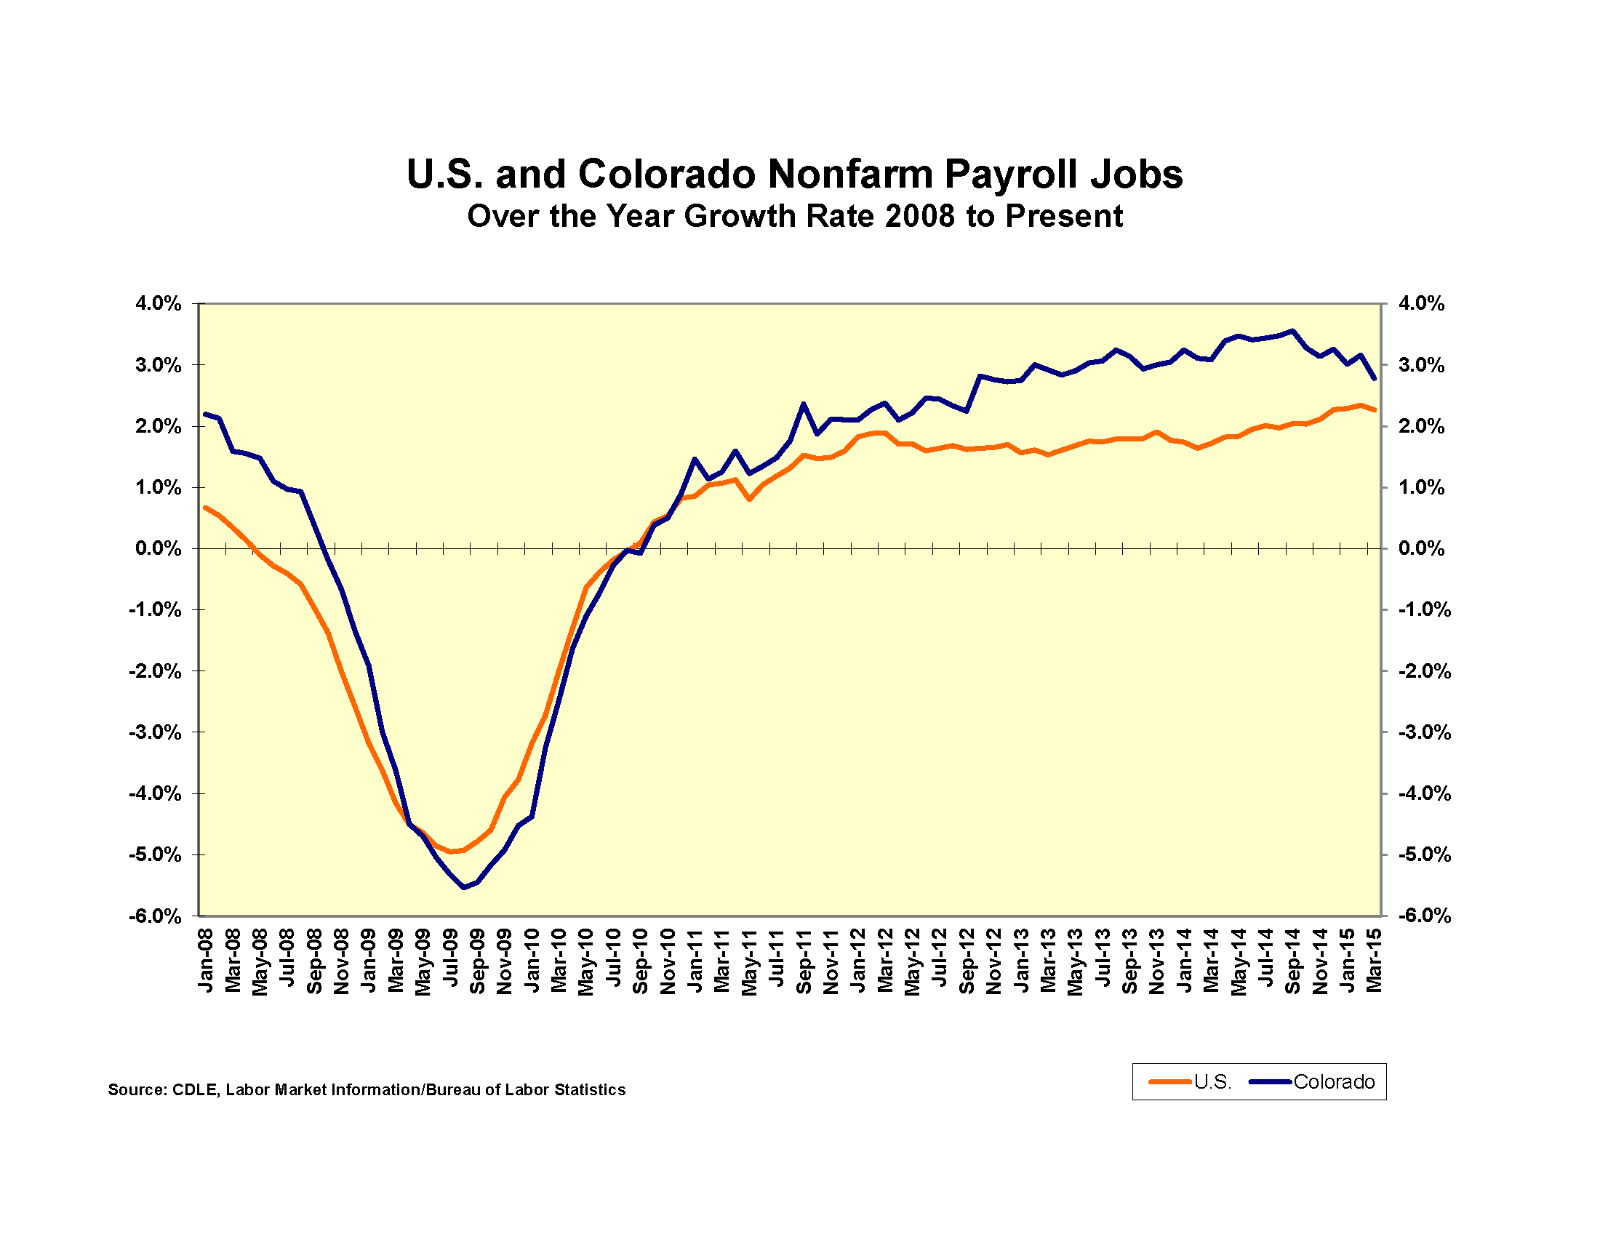 Colorado employment growth